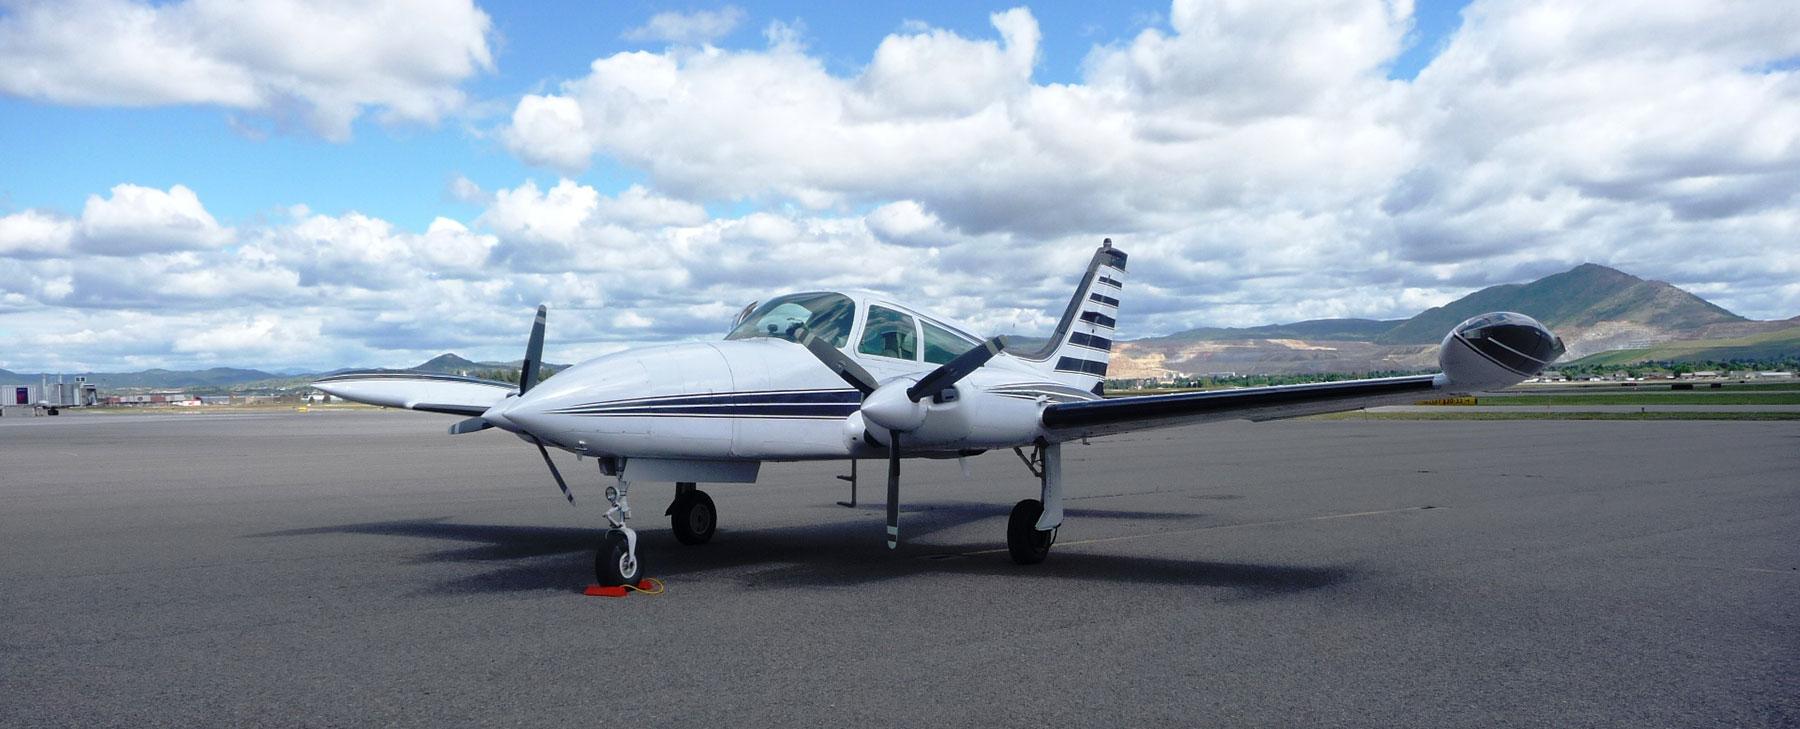 montana flight training school